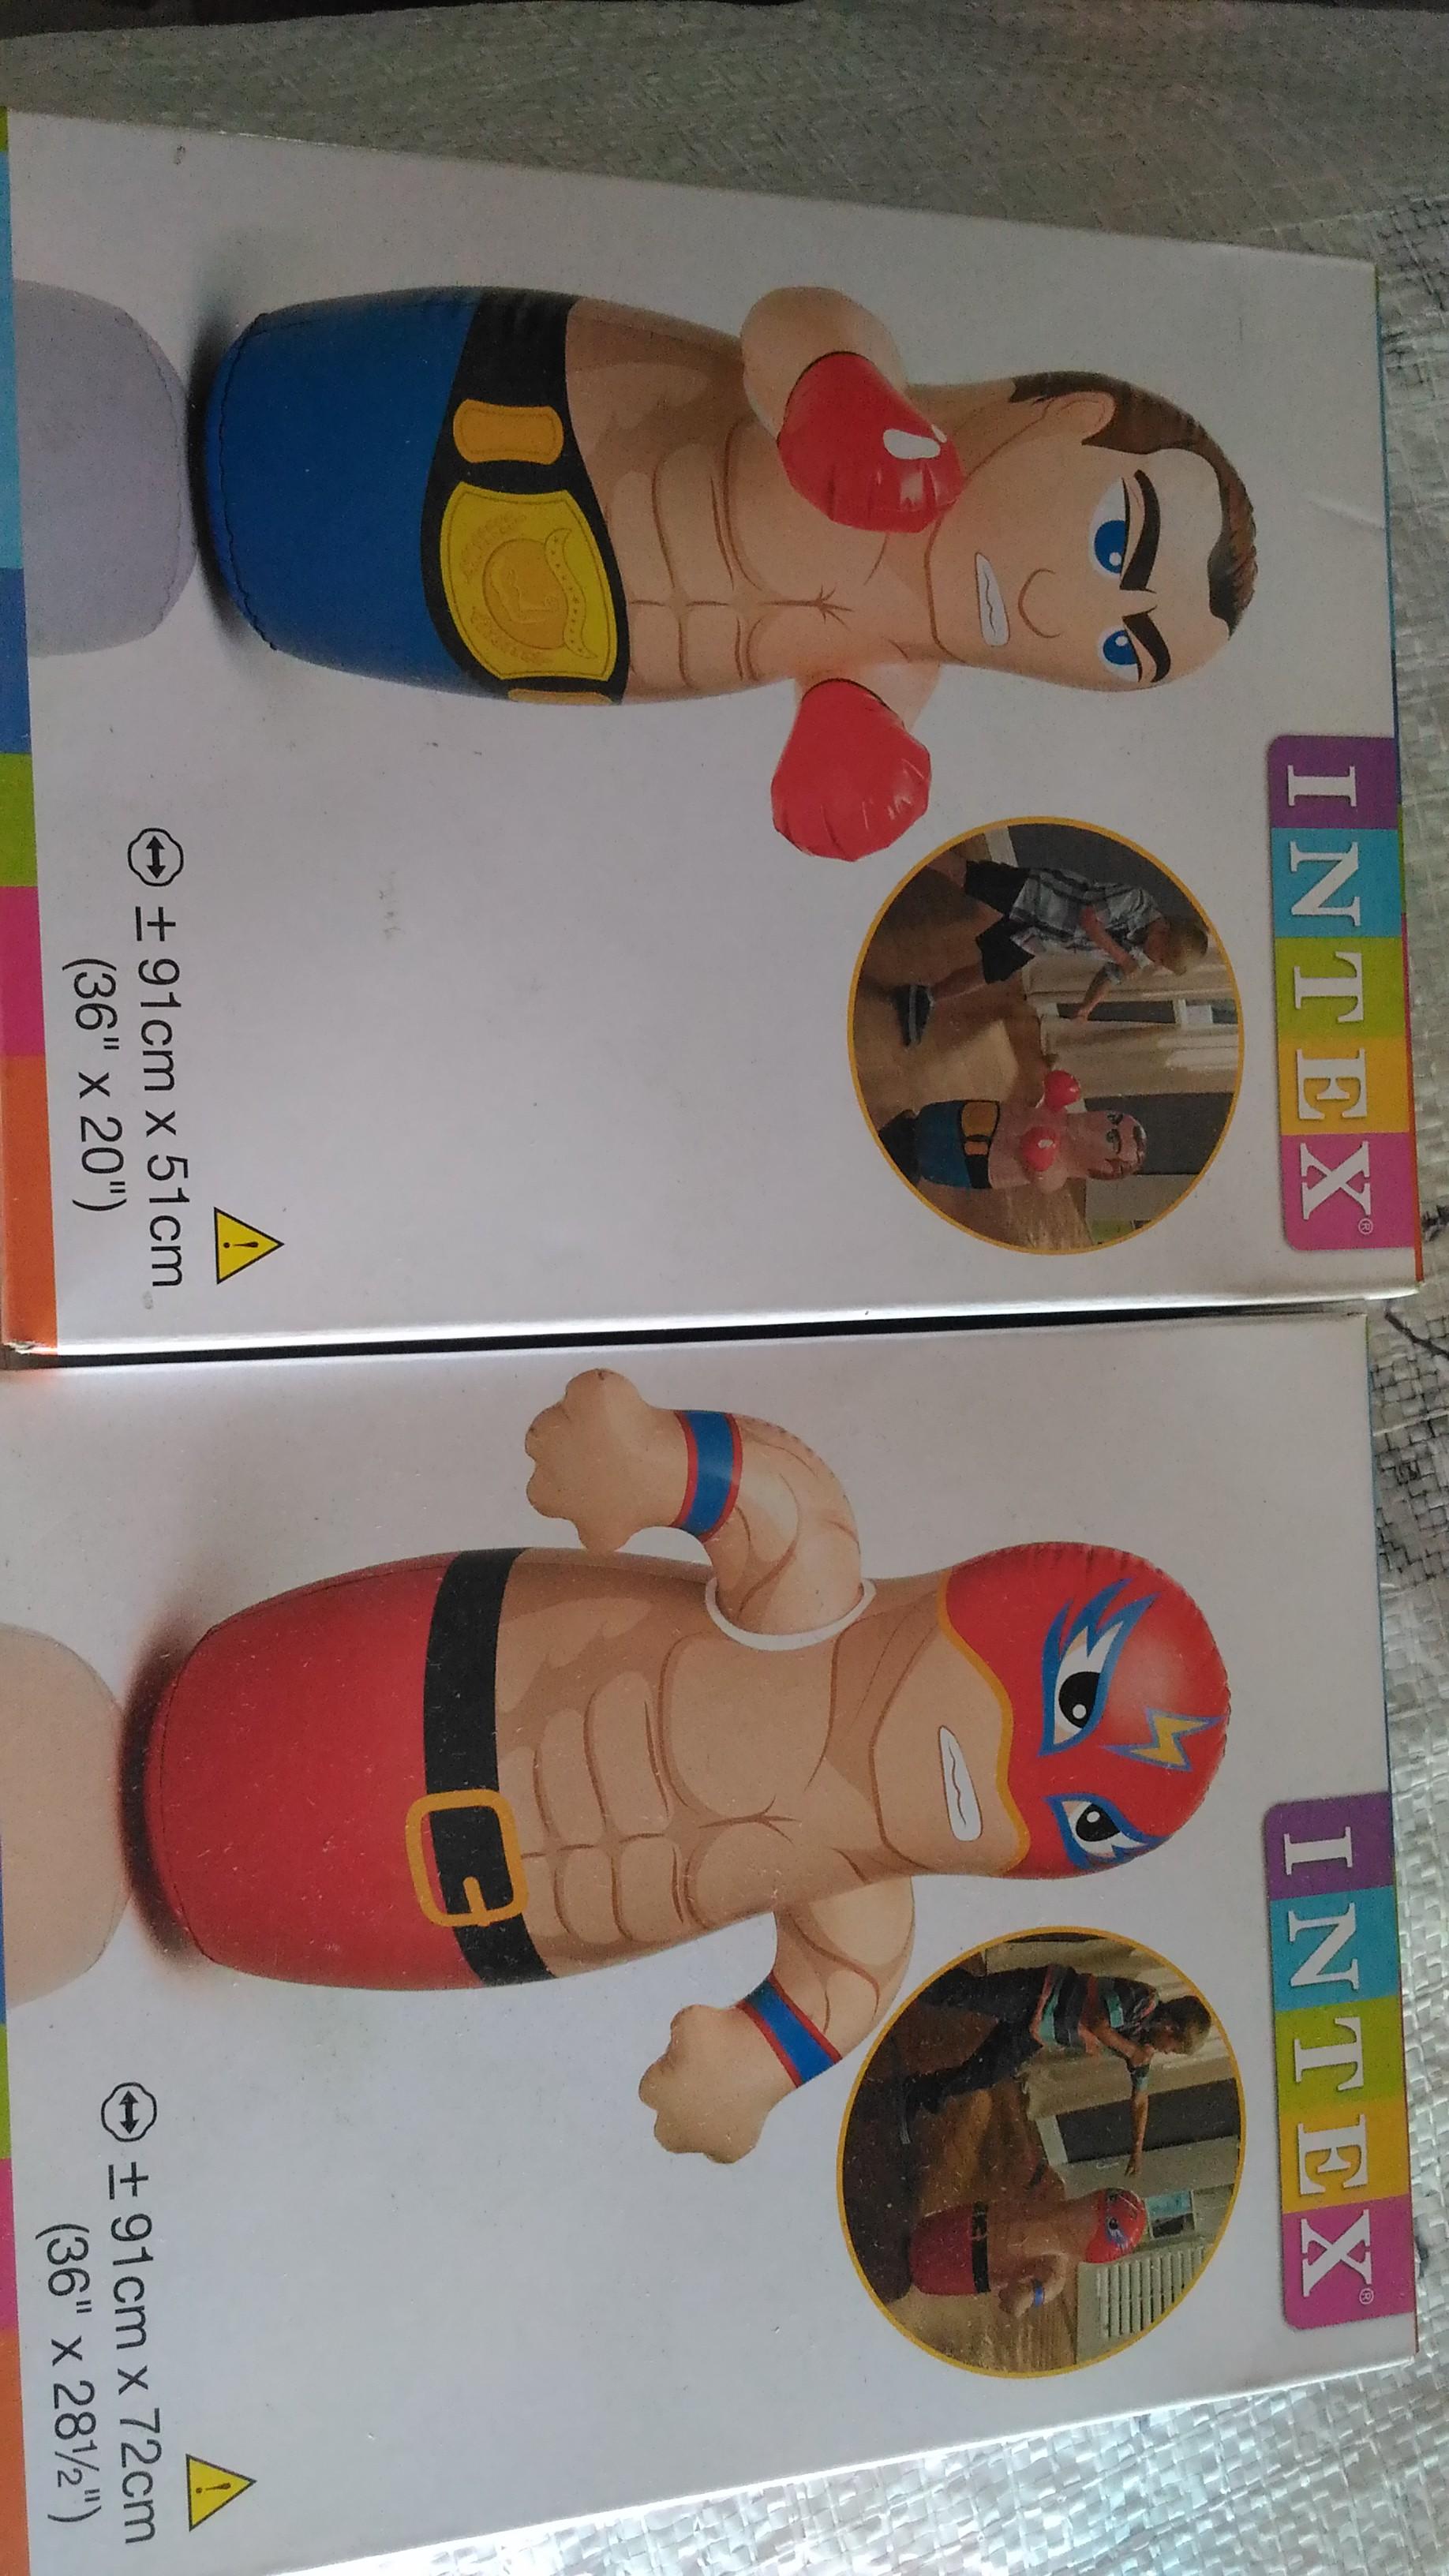 Jual Balon Tinju Besar Mainan Berdiri Punching Sack Intex Ori Kepo Belanja Tokopedia